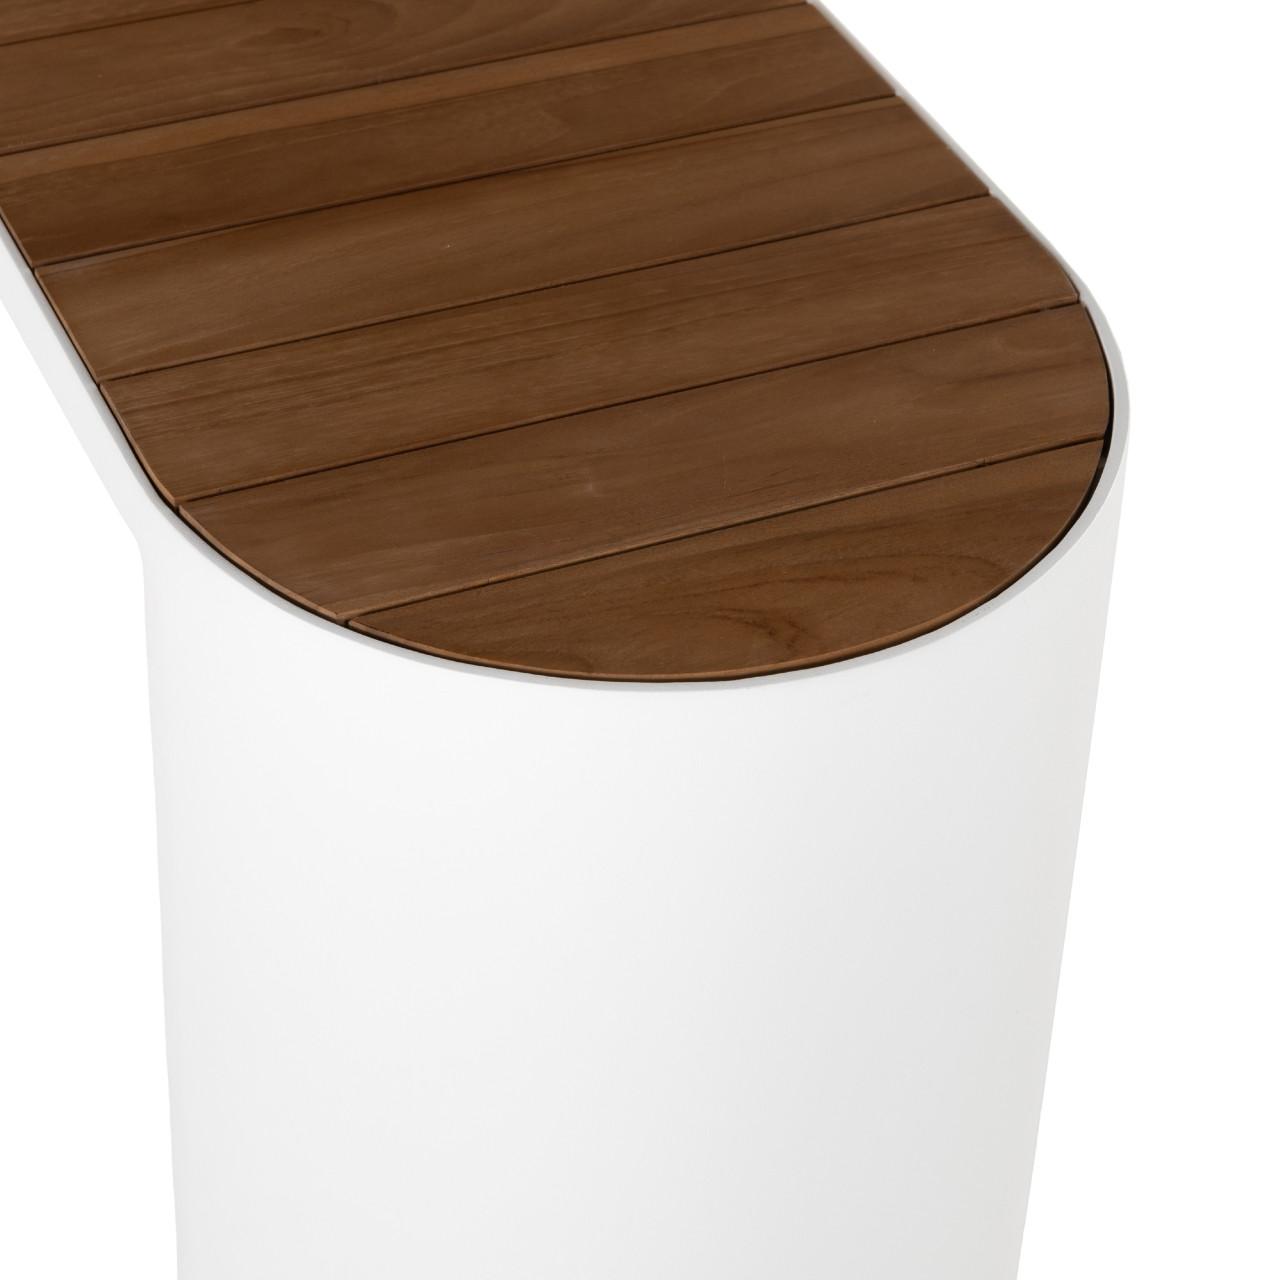 Kye Outdoor Bench W/Planter - White